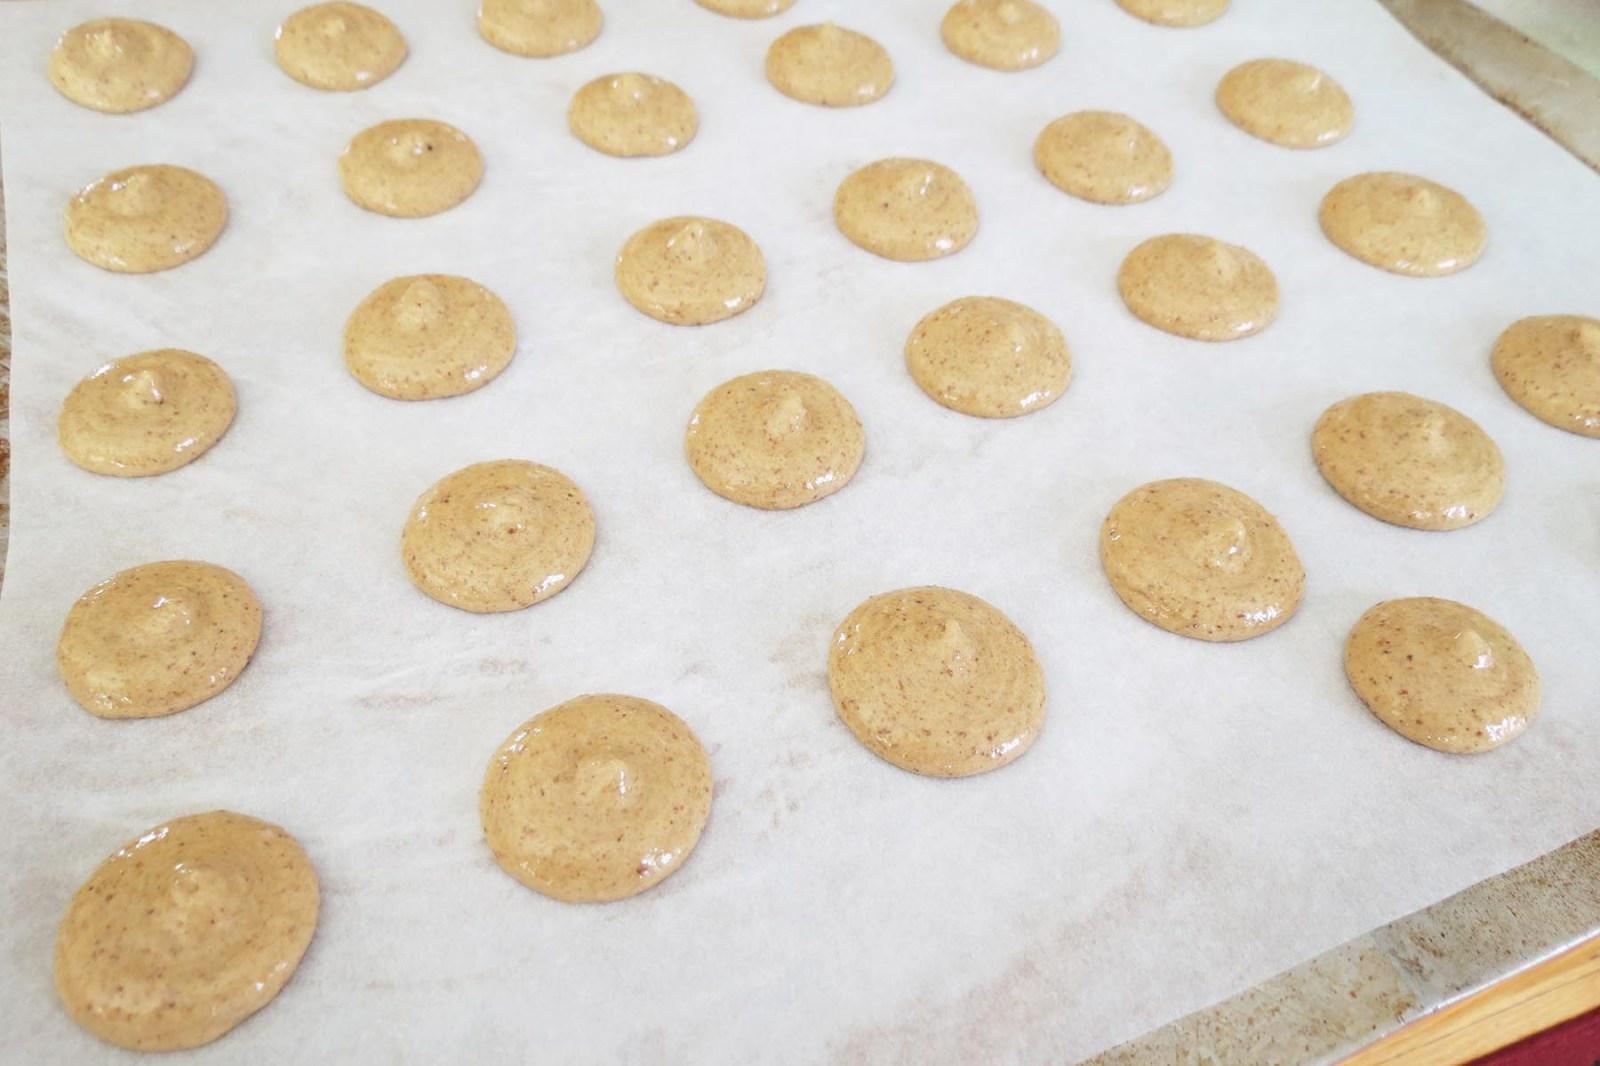 shells-before-baking